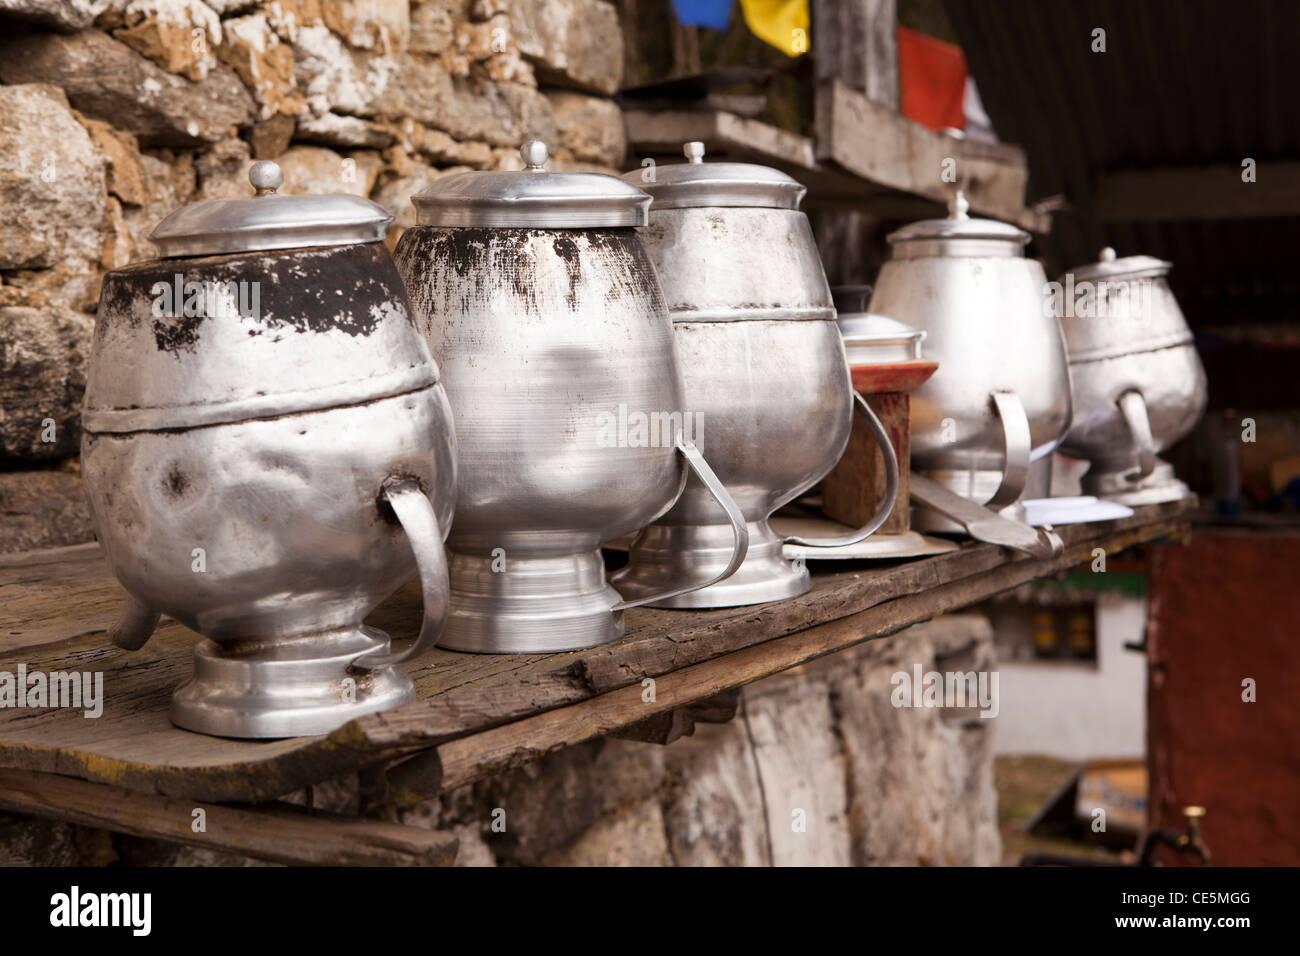 L'Inde, de l'Arunachal Pradesh, Tawang, Thongmen Gompa, chaudrons de métal à l'extérieur Photo Stock